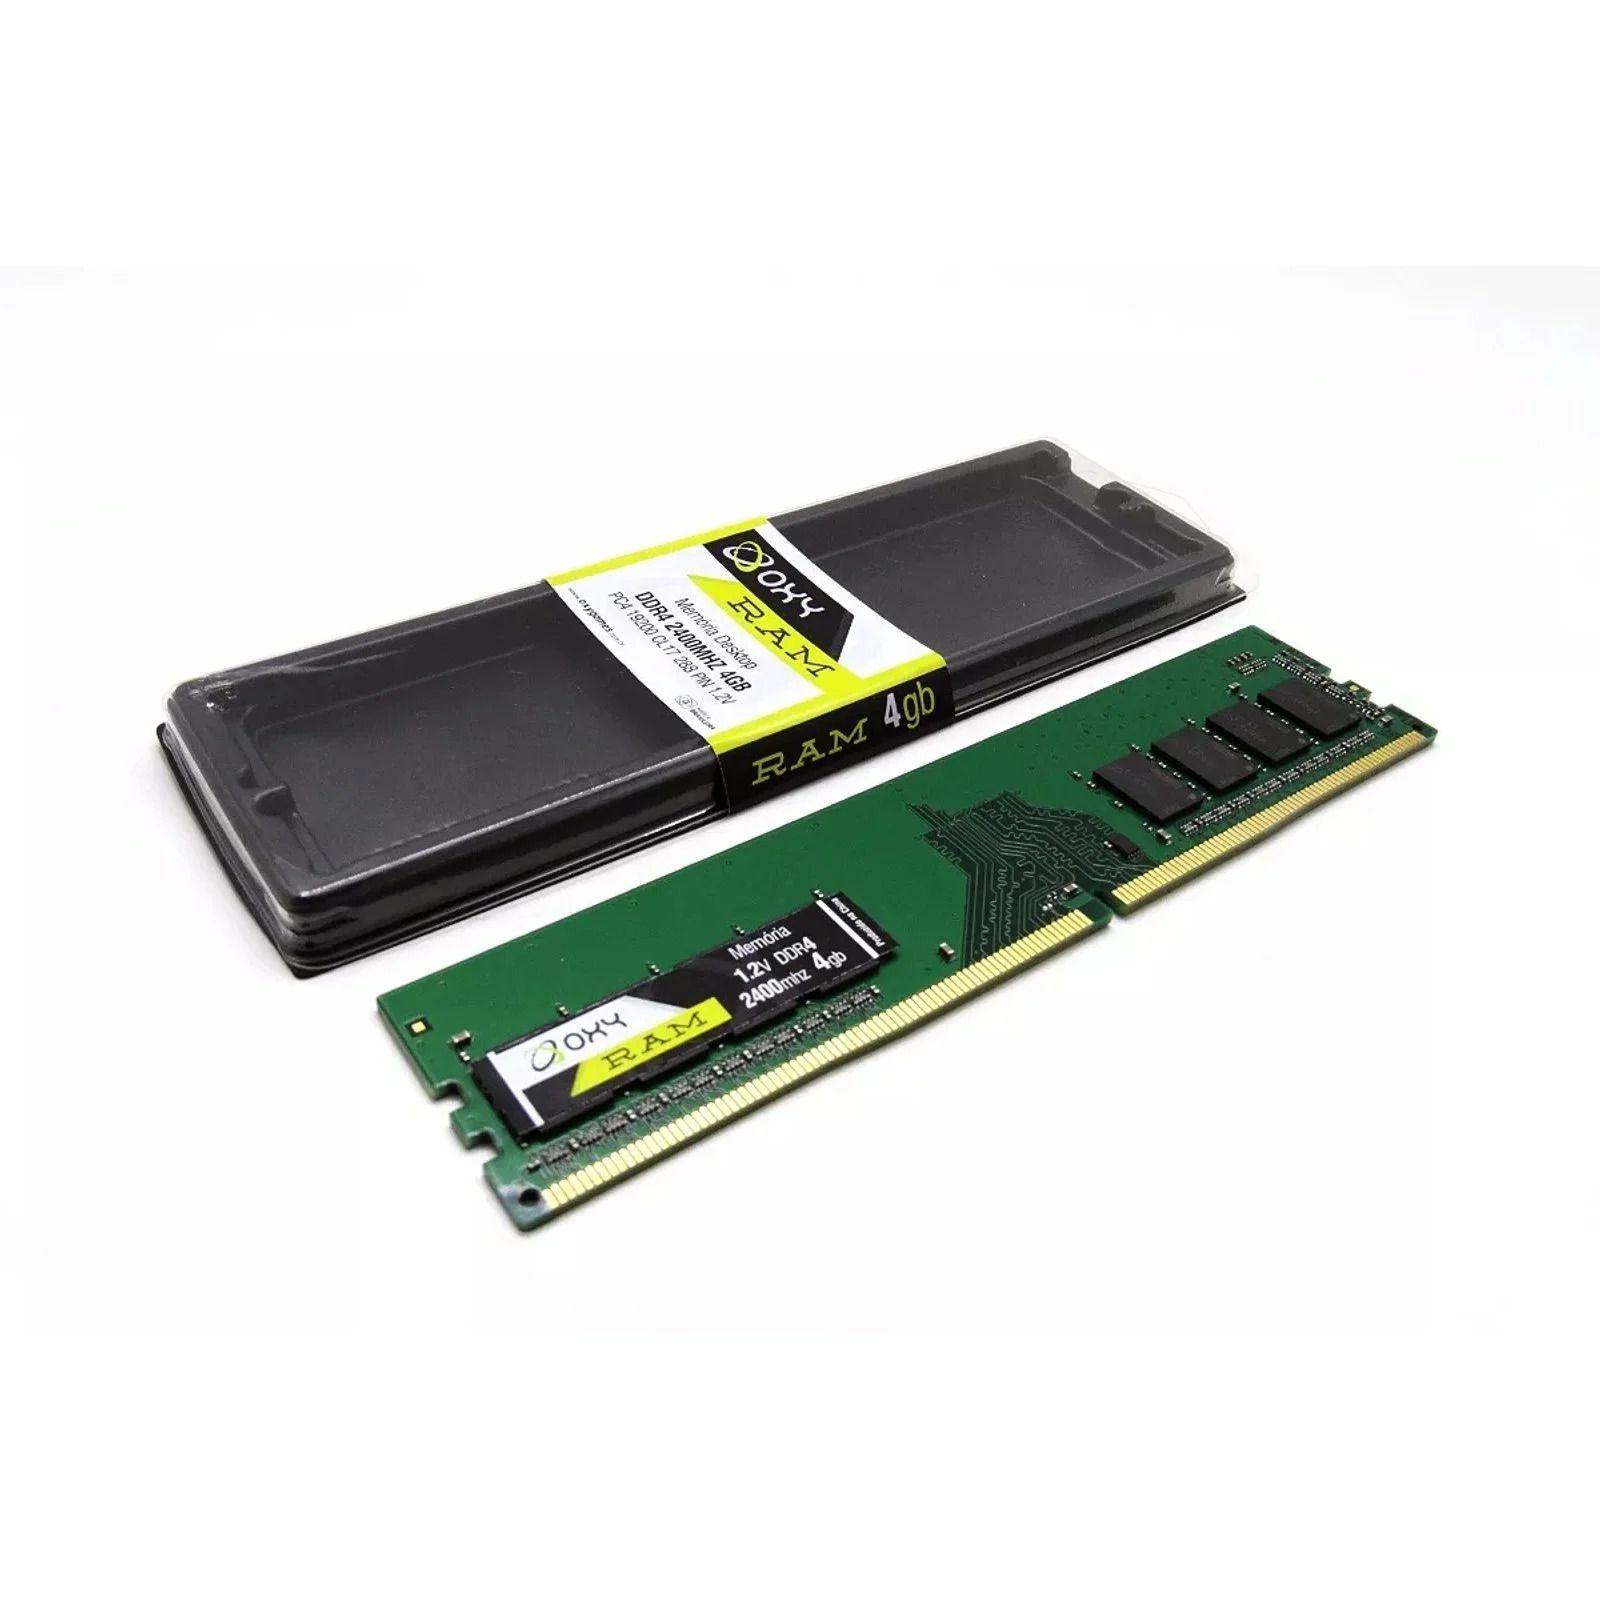 Memória 4Gb DDR4 2400Mhz OXY para PC